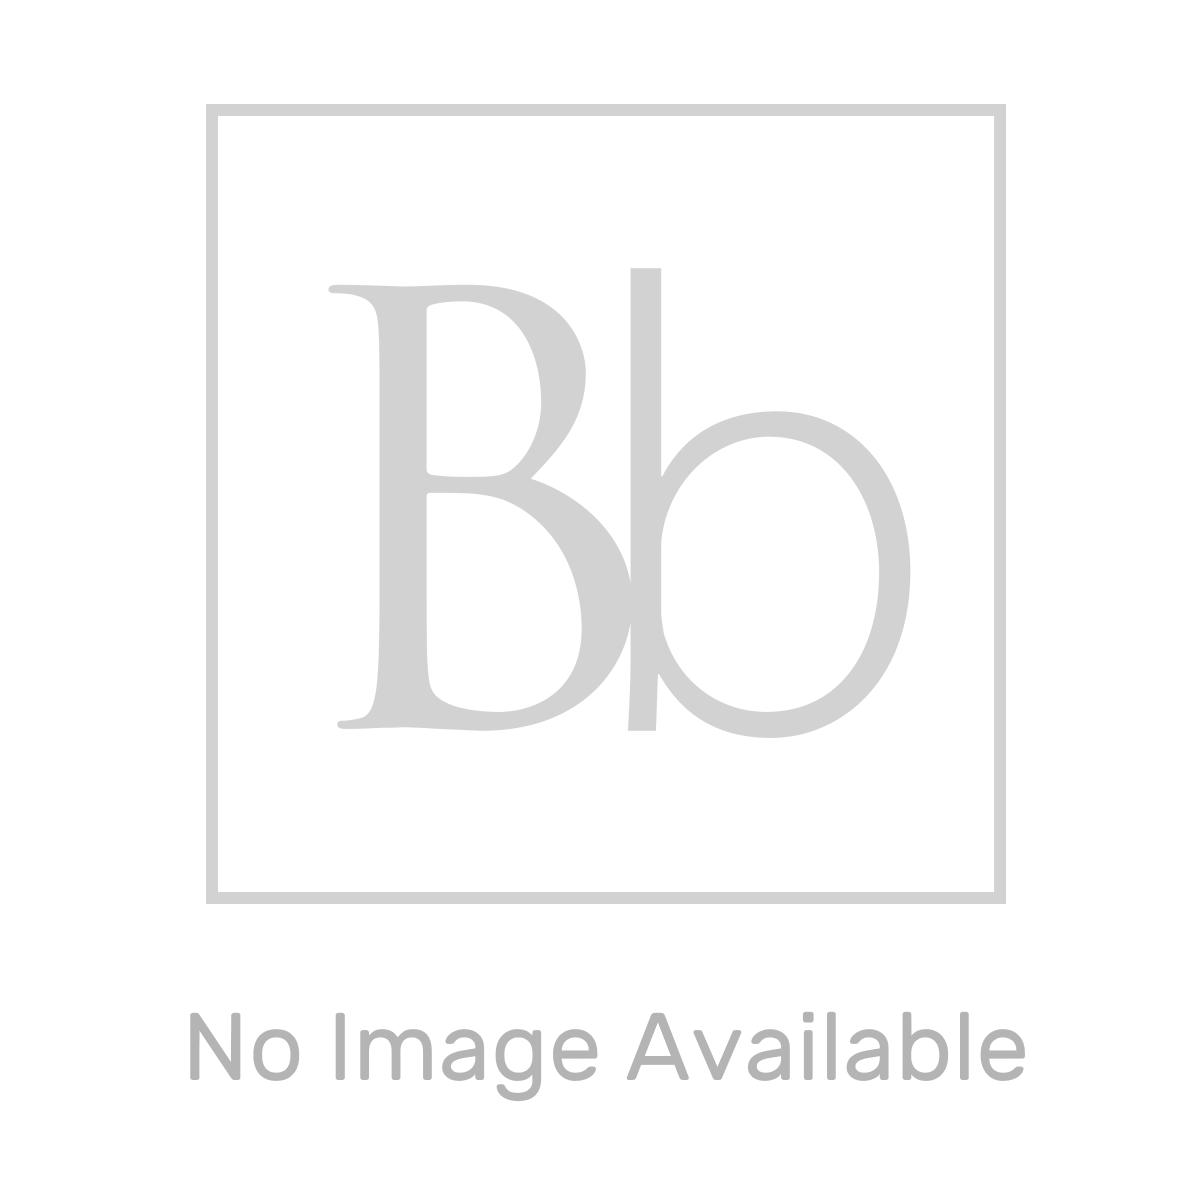 Nuie Linton Straight Shower Bath 1700 x 750mm Dimensions